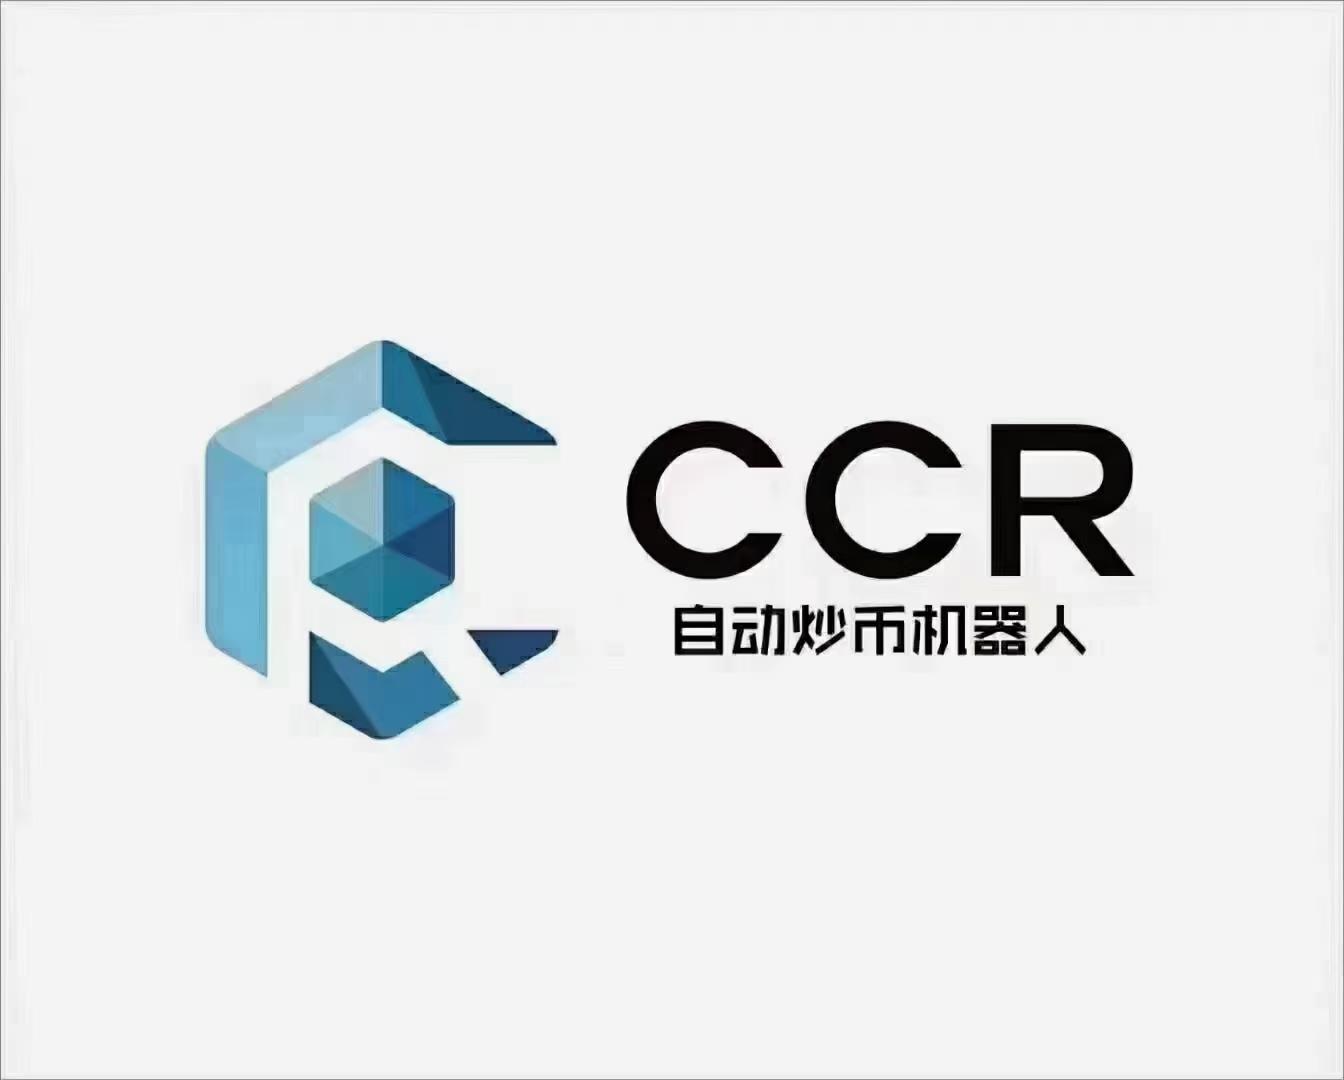 CCR炒币机器人:币圈炒币之技术分析